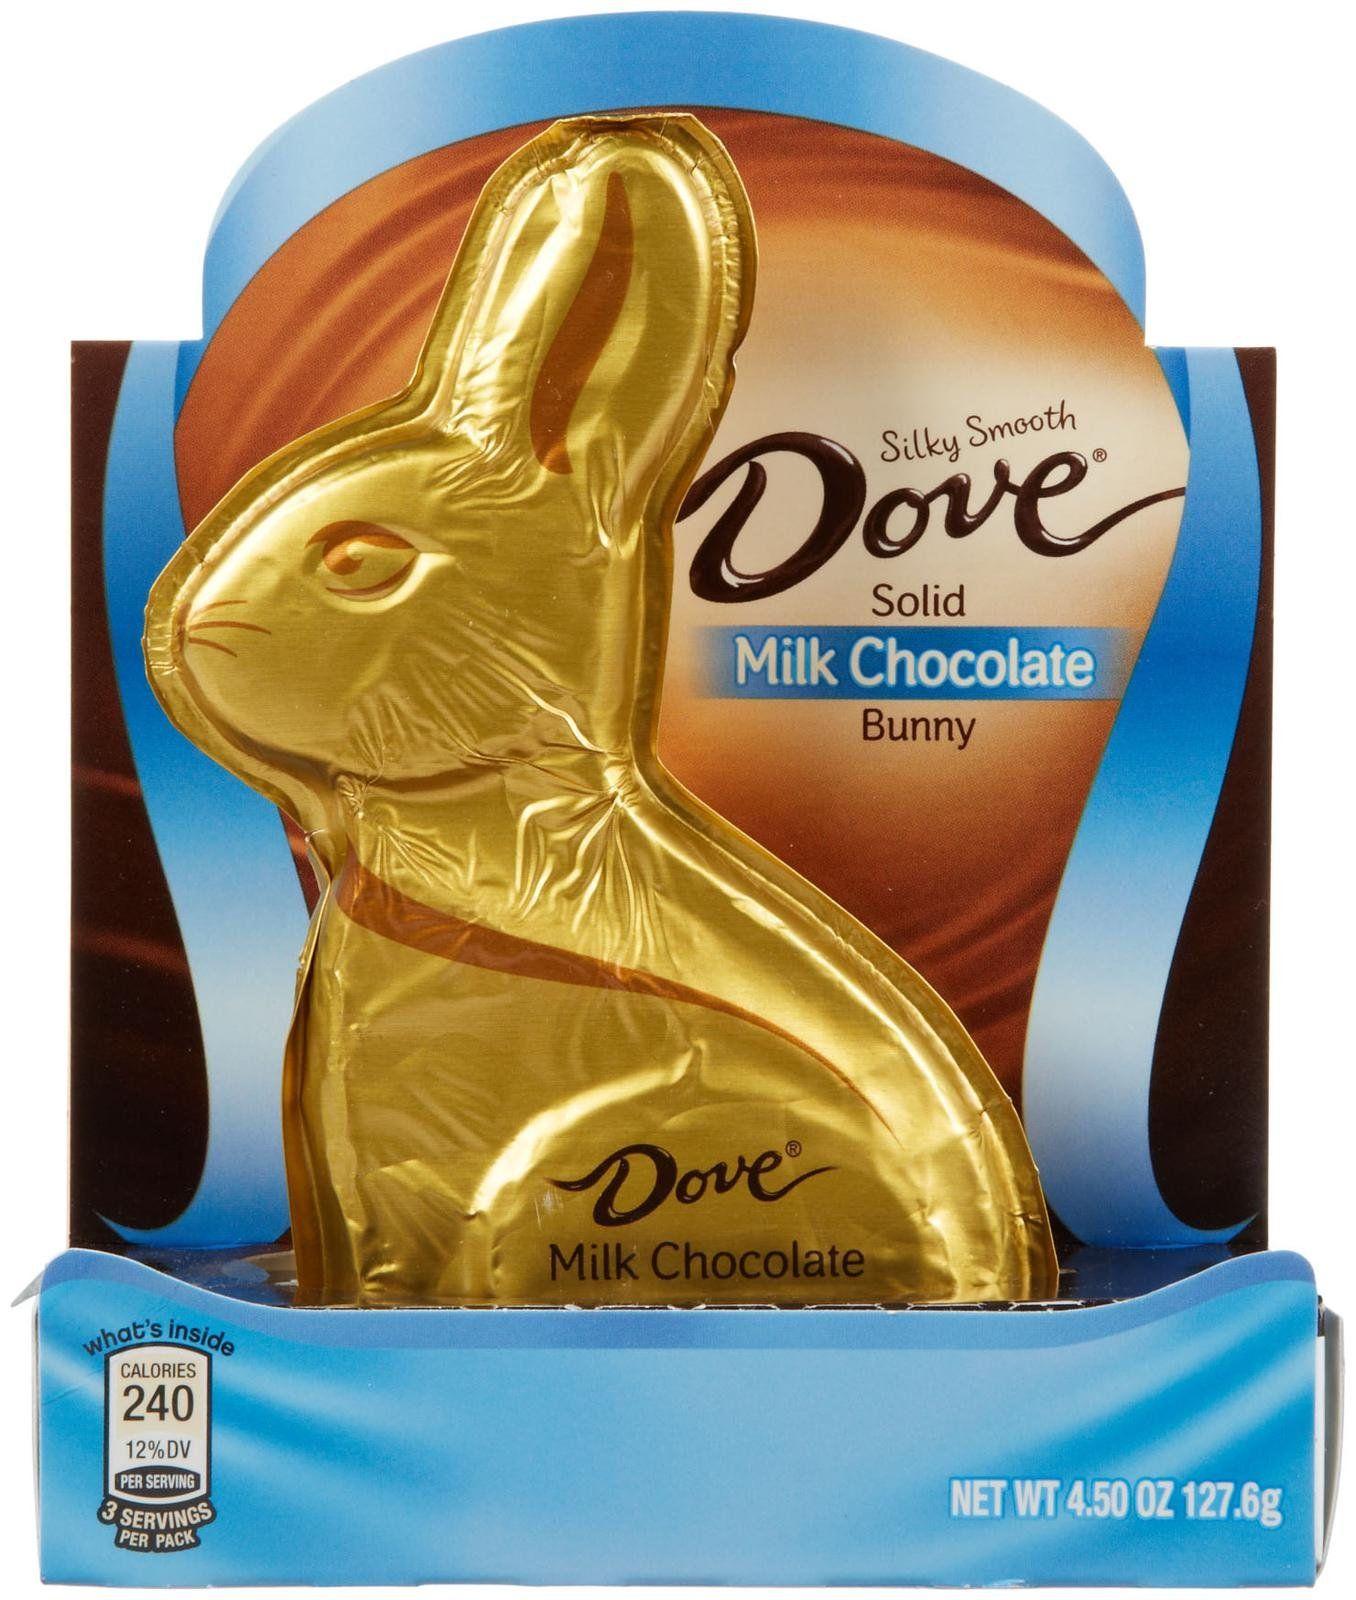 Silky Smooth Dove Solid Milk Chocolate Bunny Chocolate